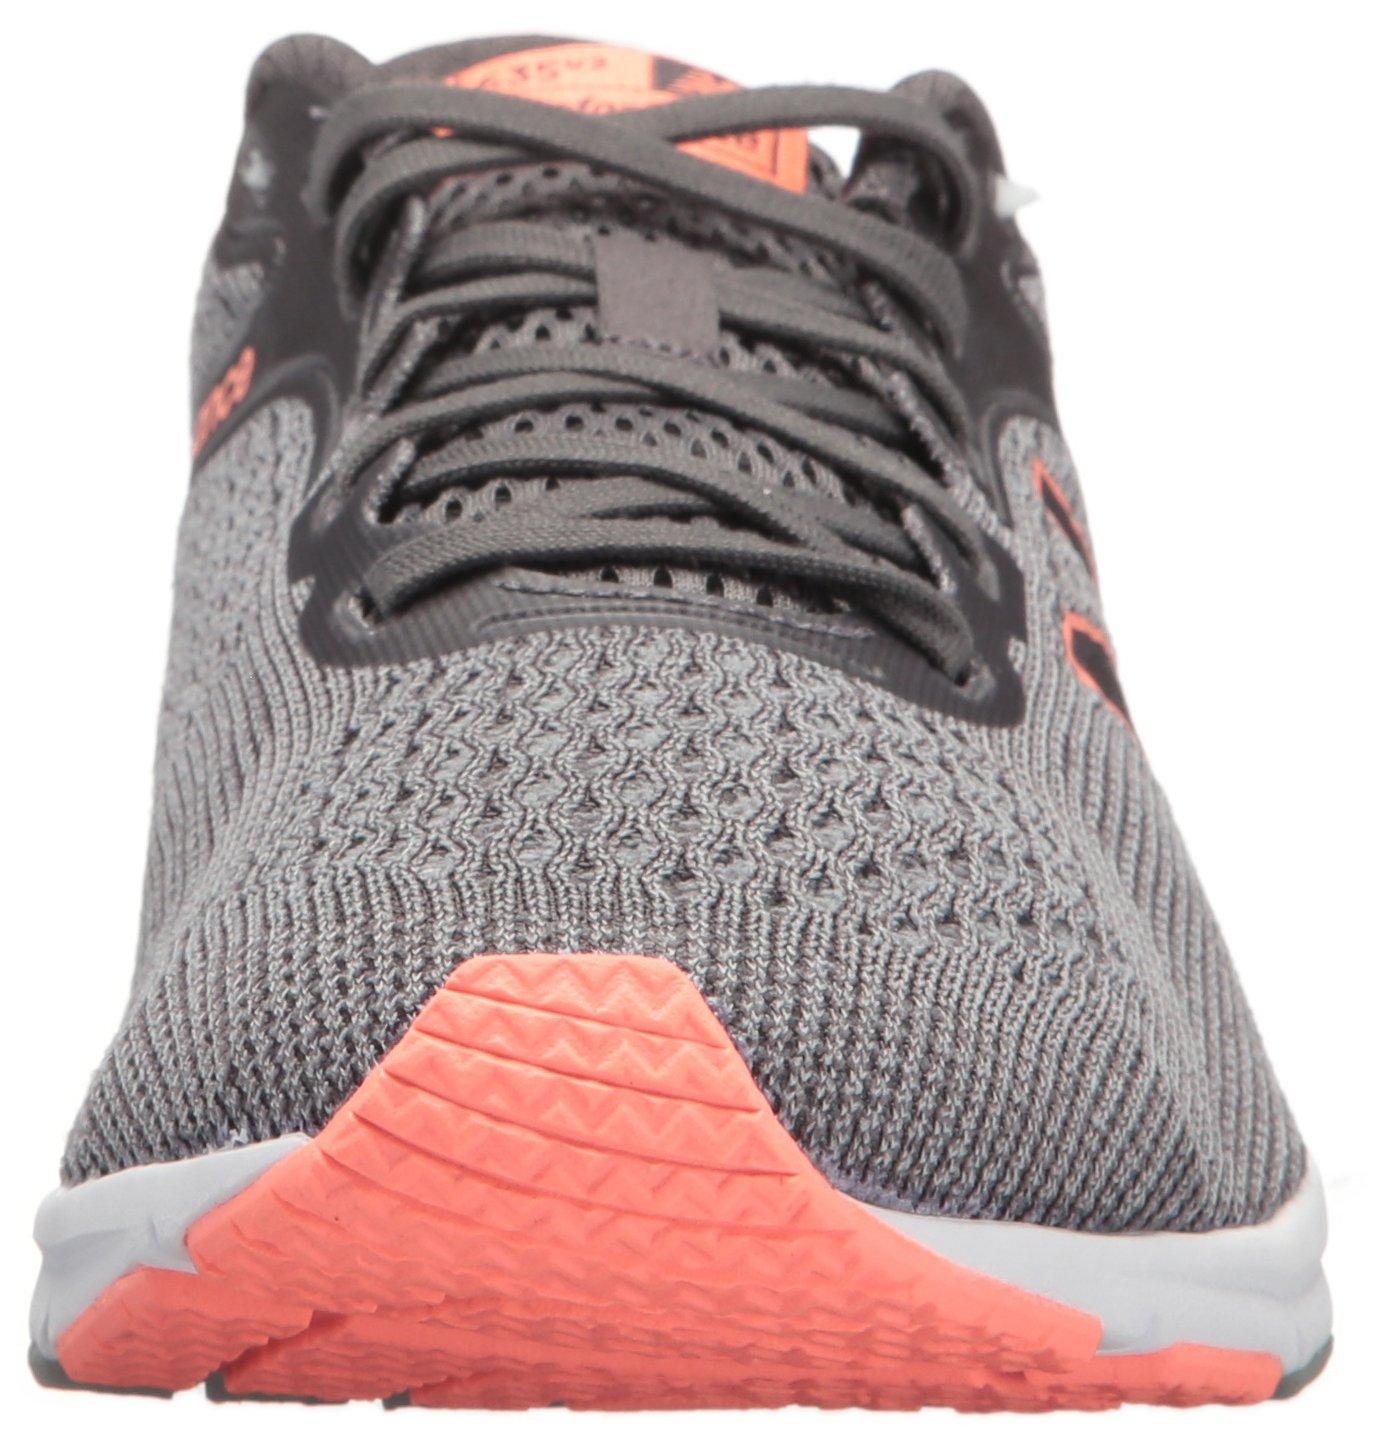 New Balance Women's 635v2 B(M) Cushioning Running Shoe B06XSF34CS 7.5 B(M) 635v2 US|Grey 735a61